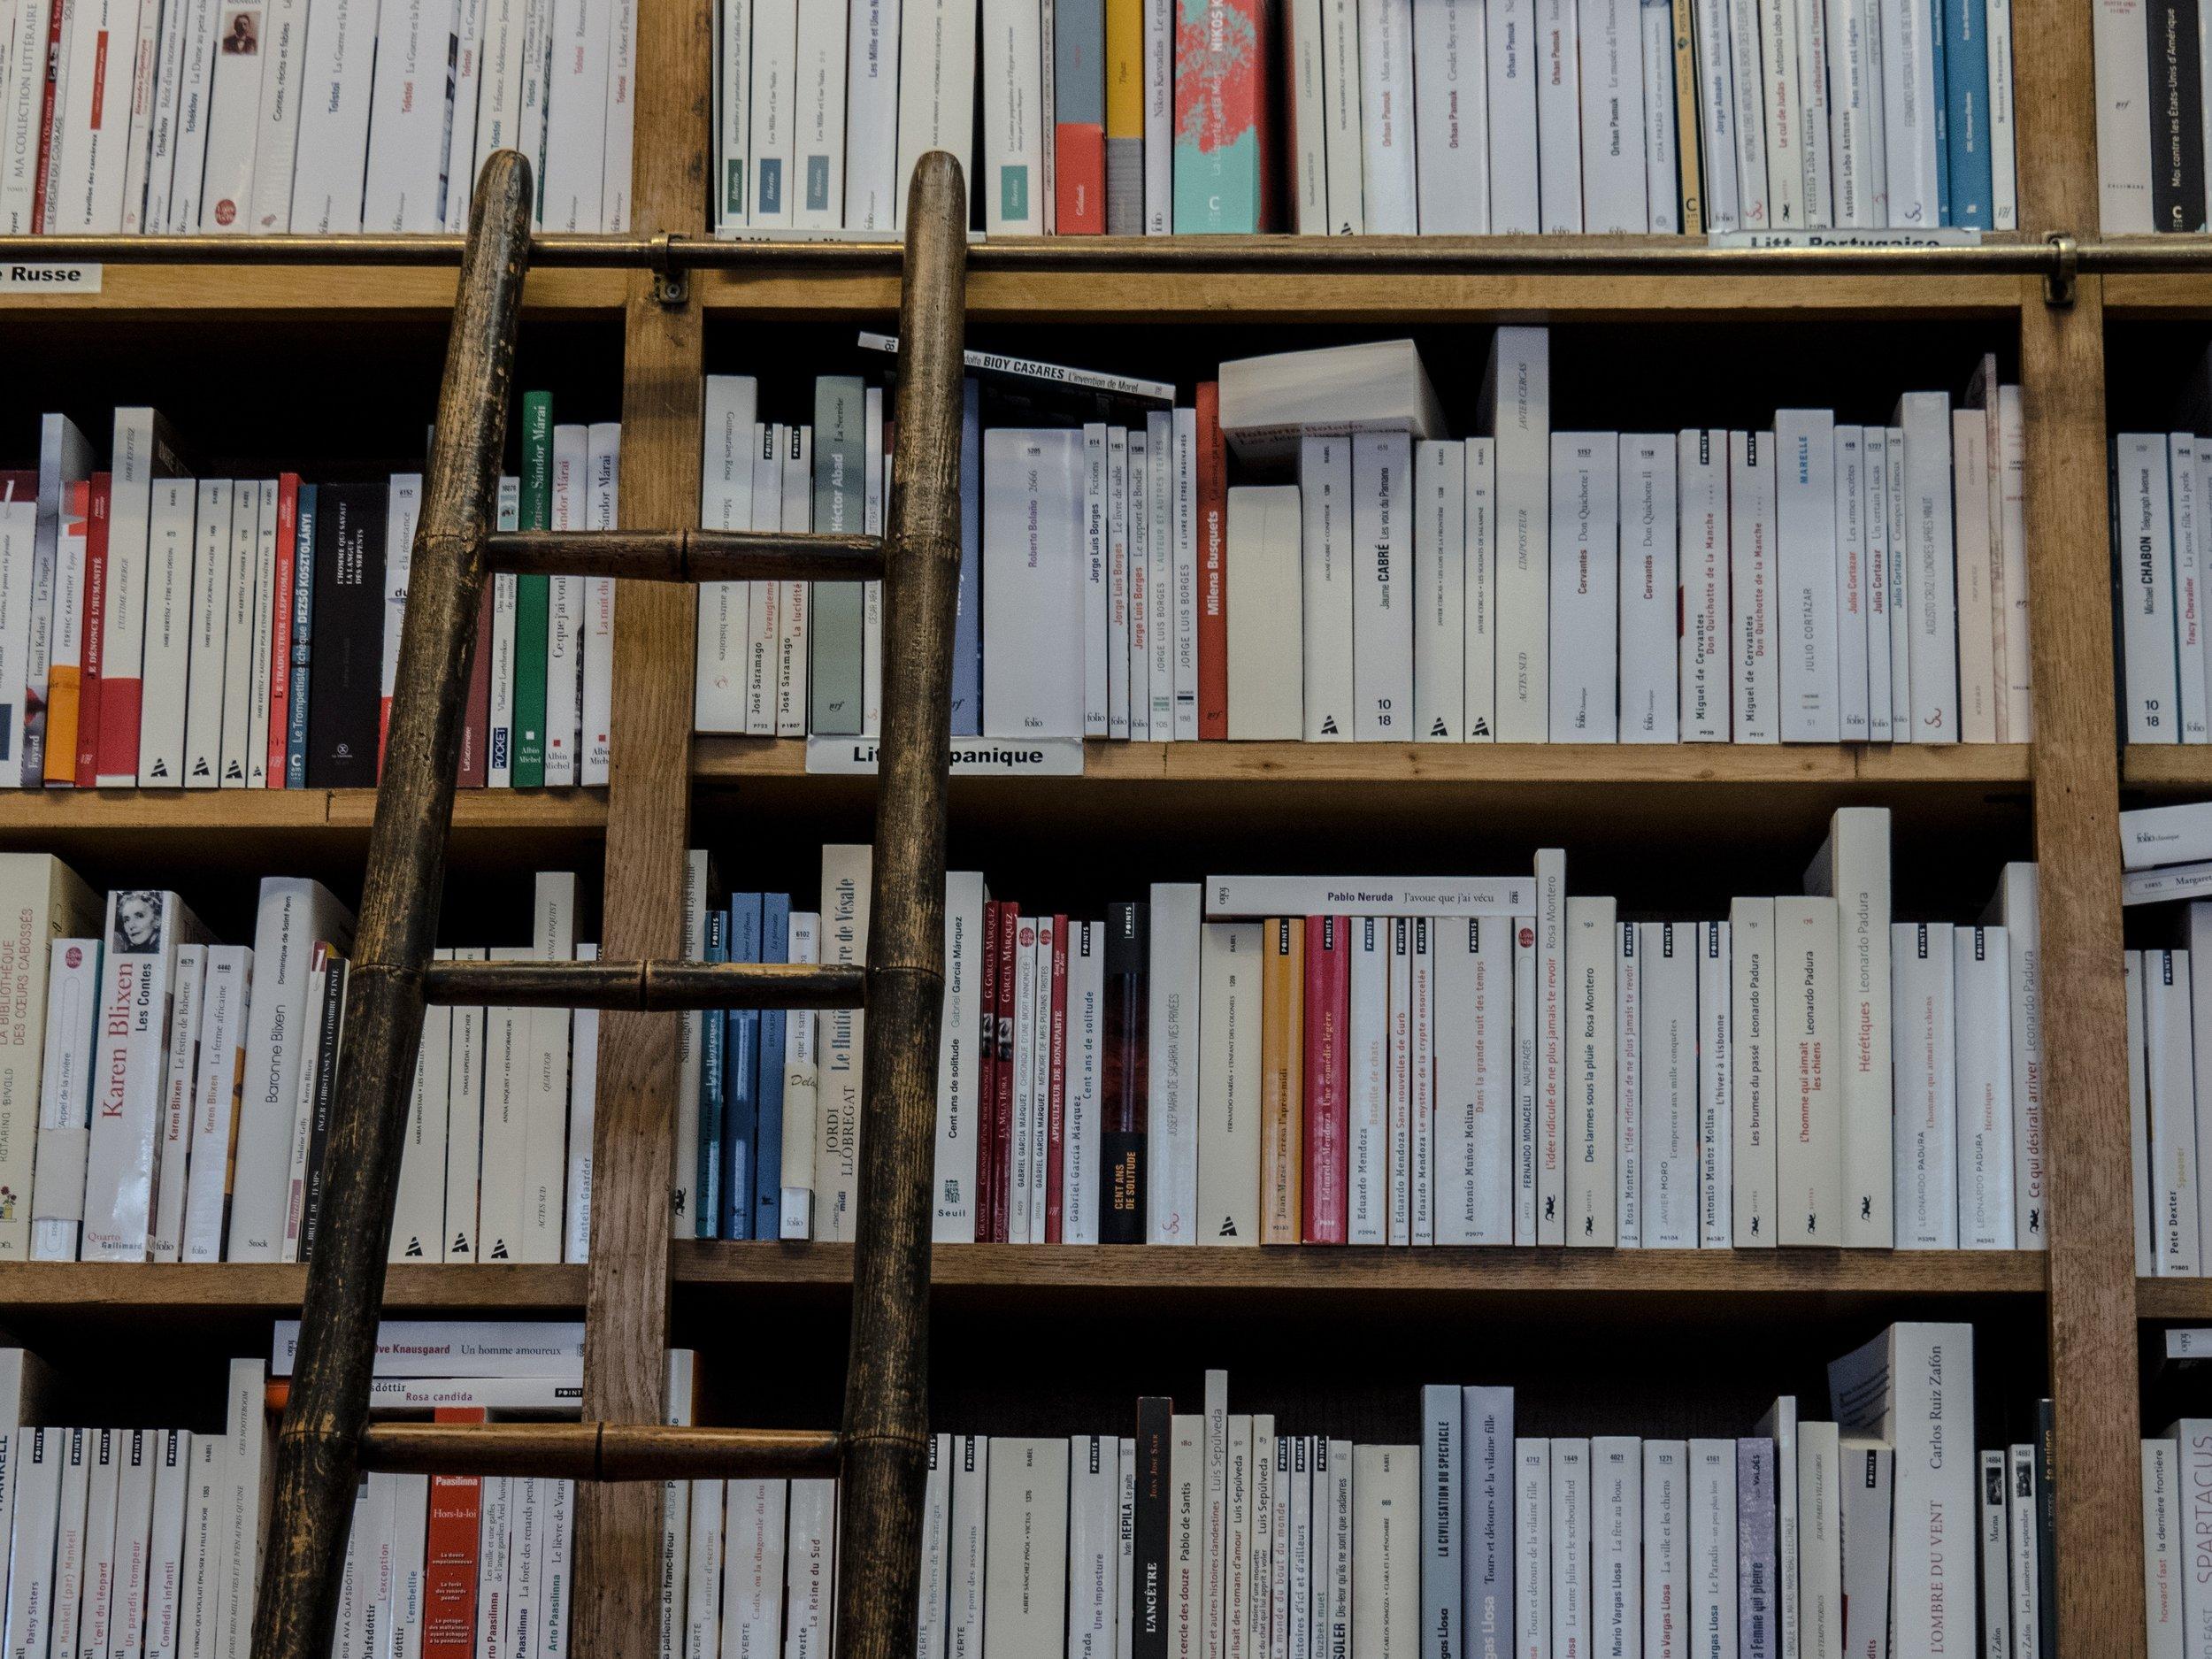 bookcase-books-bookshop-220326.jpg